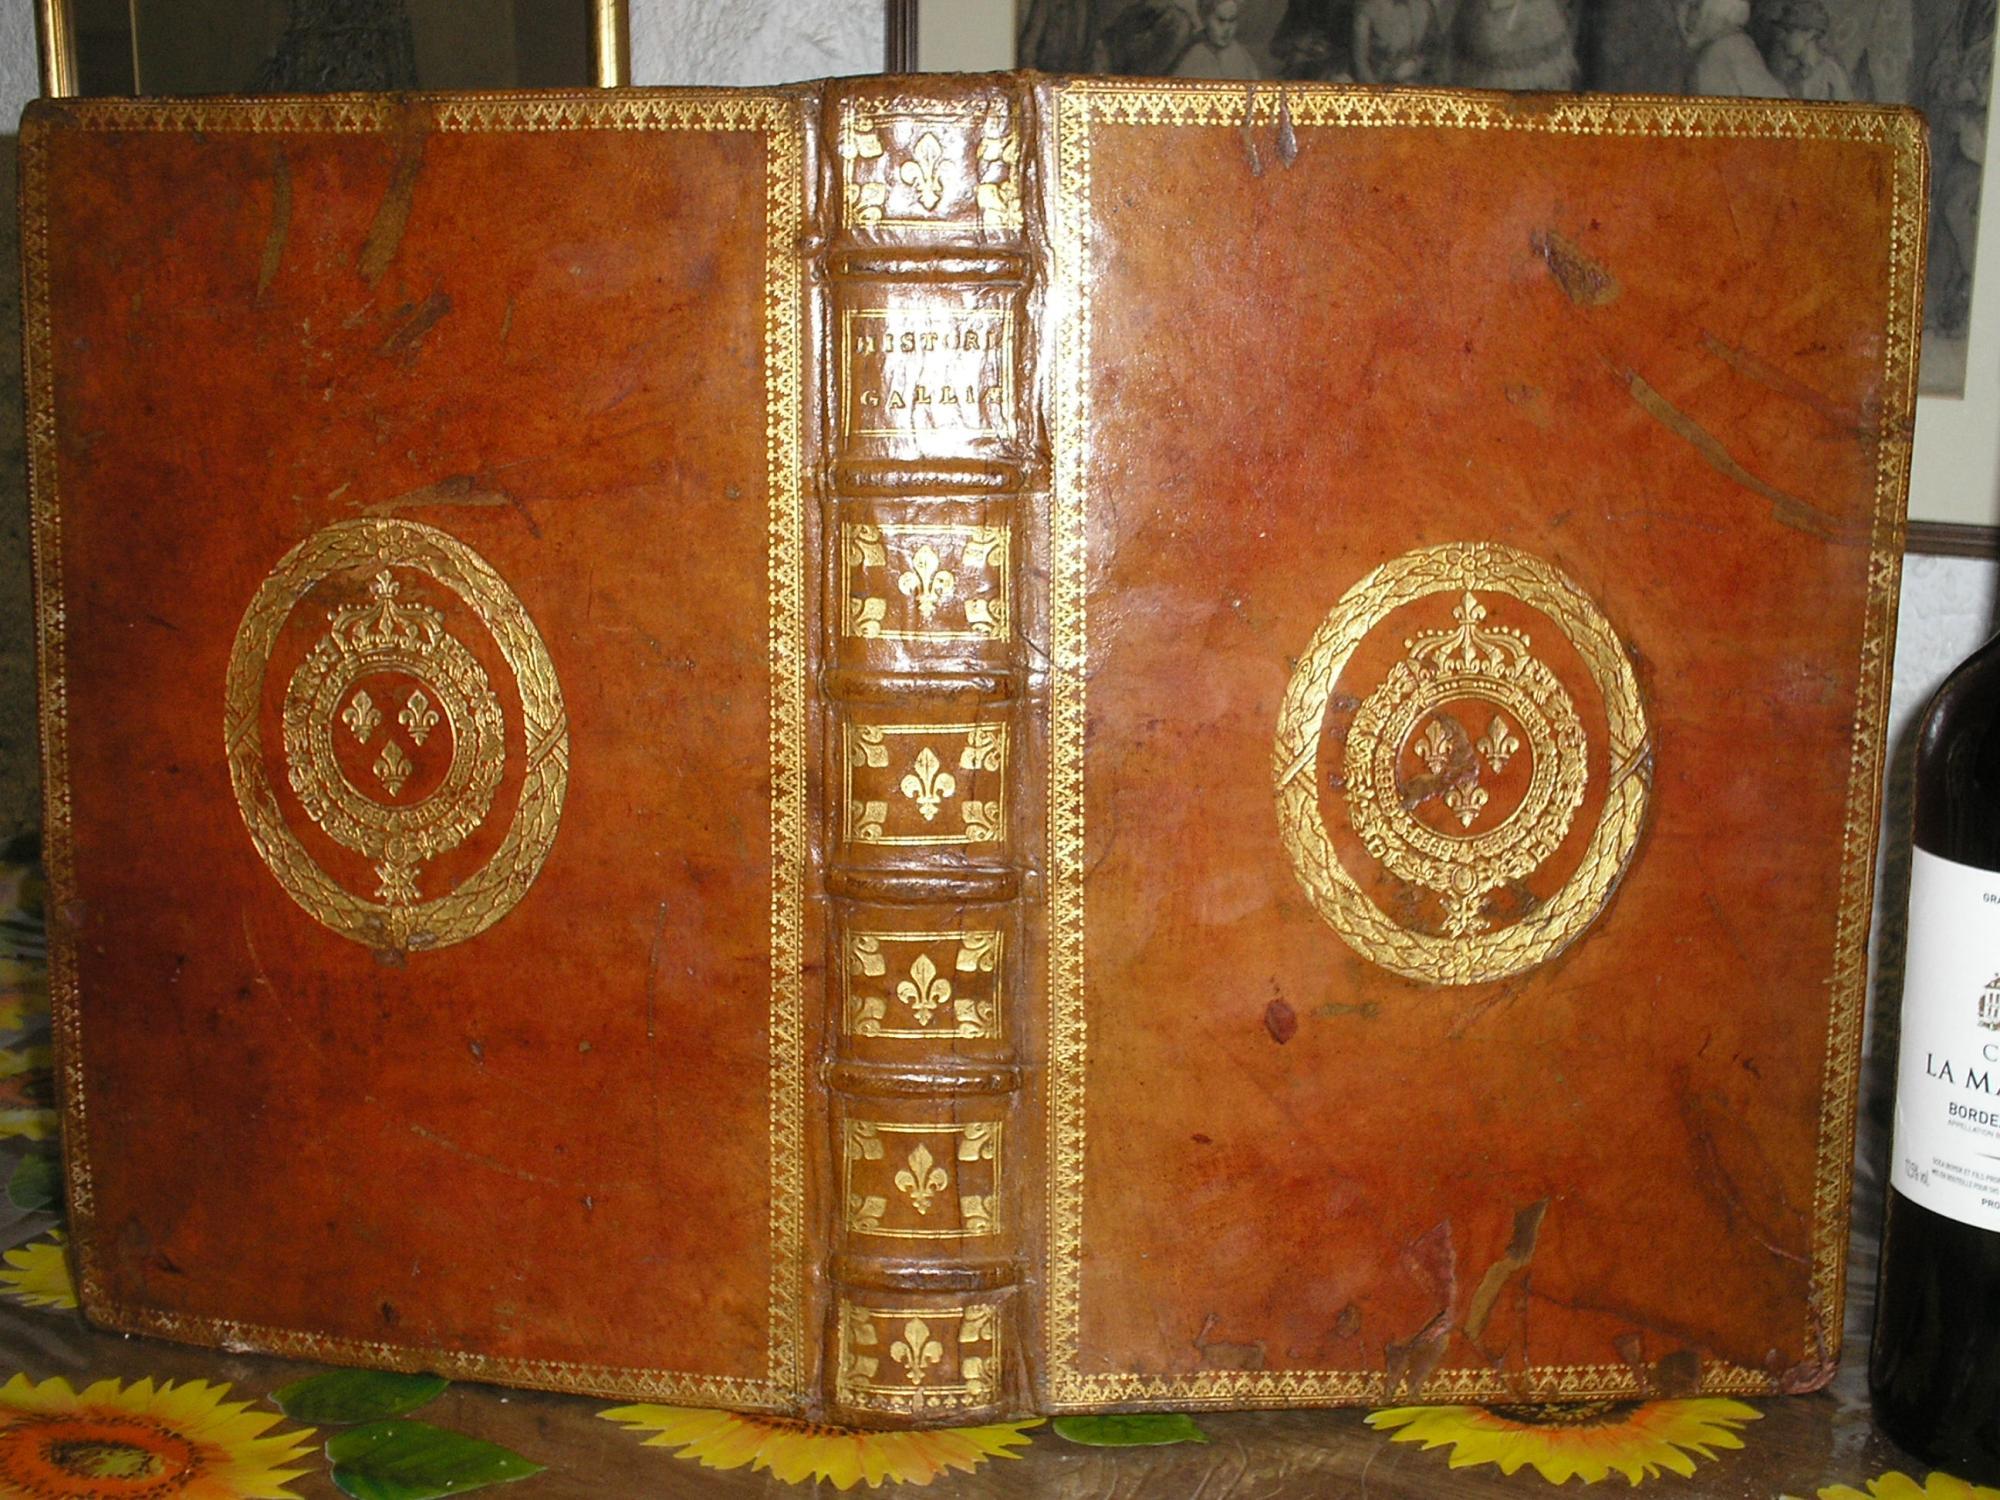 A FOLIO LOUIS XIV PRIZE BINDING : HISTORIARUM GALLIAE AB EXCESSU HENRICI IV,libri XVIII: Gabr. ...